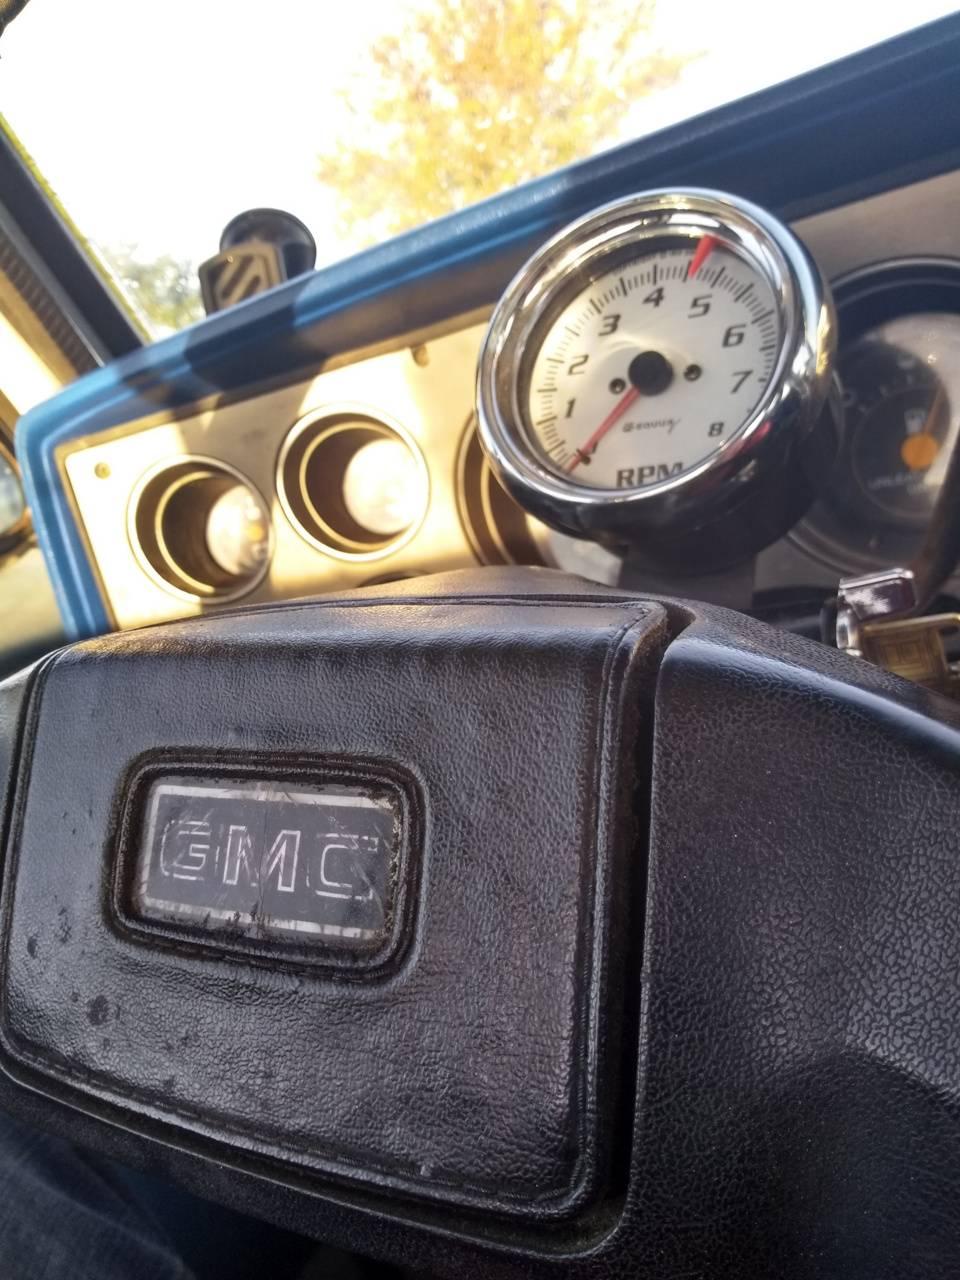 Truck cars